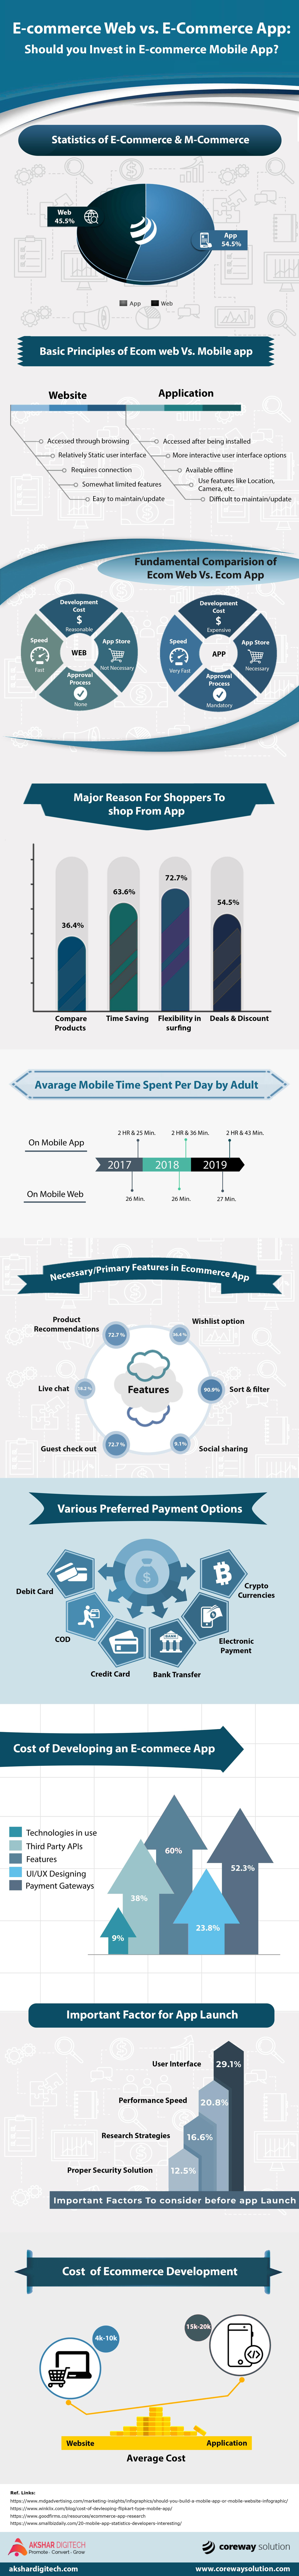 infographic-coreway-final-2